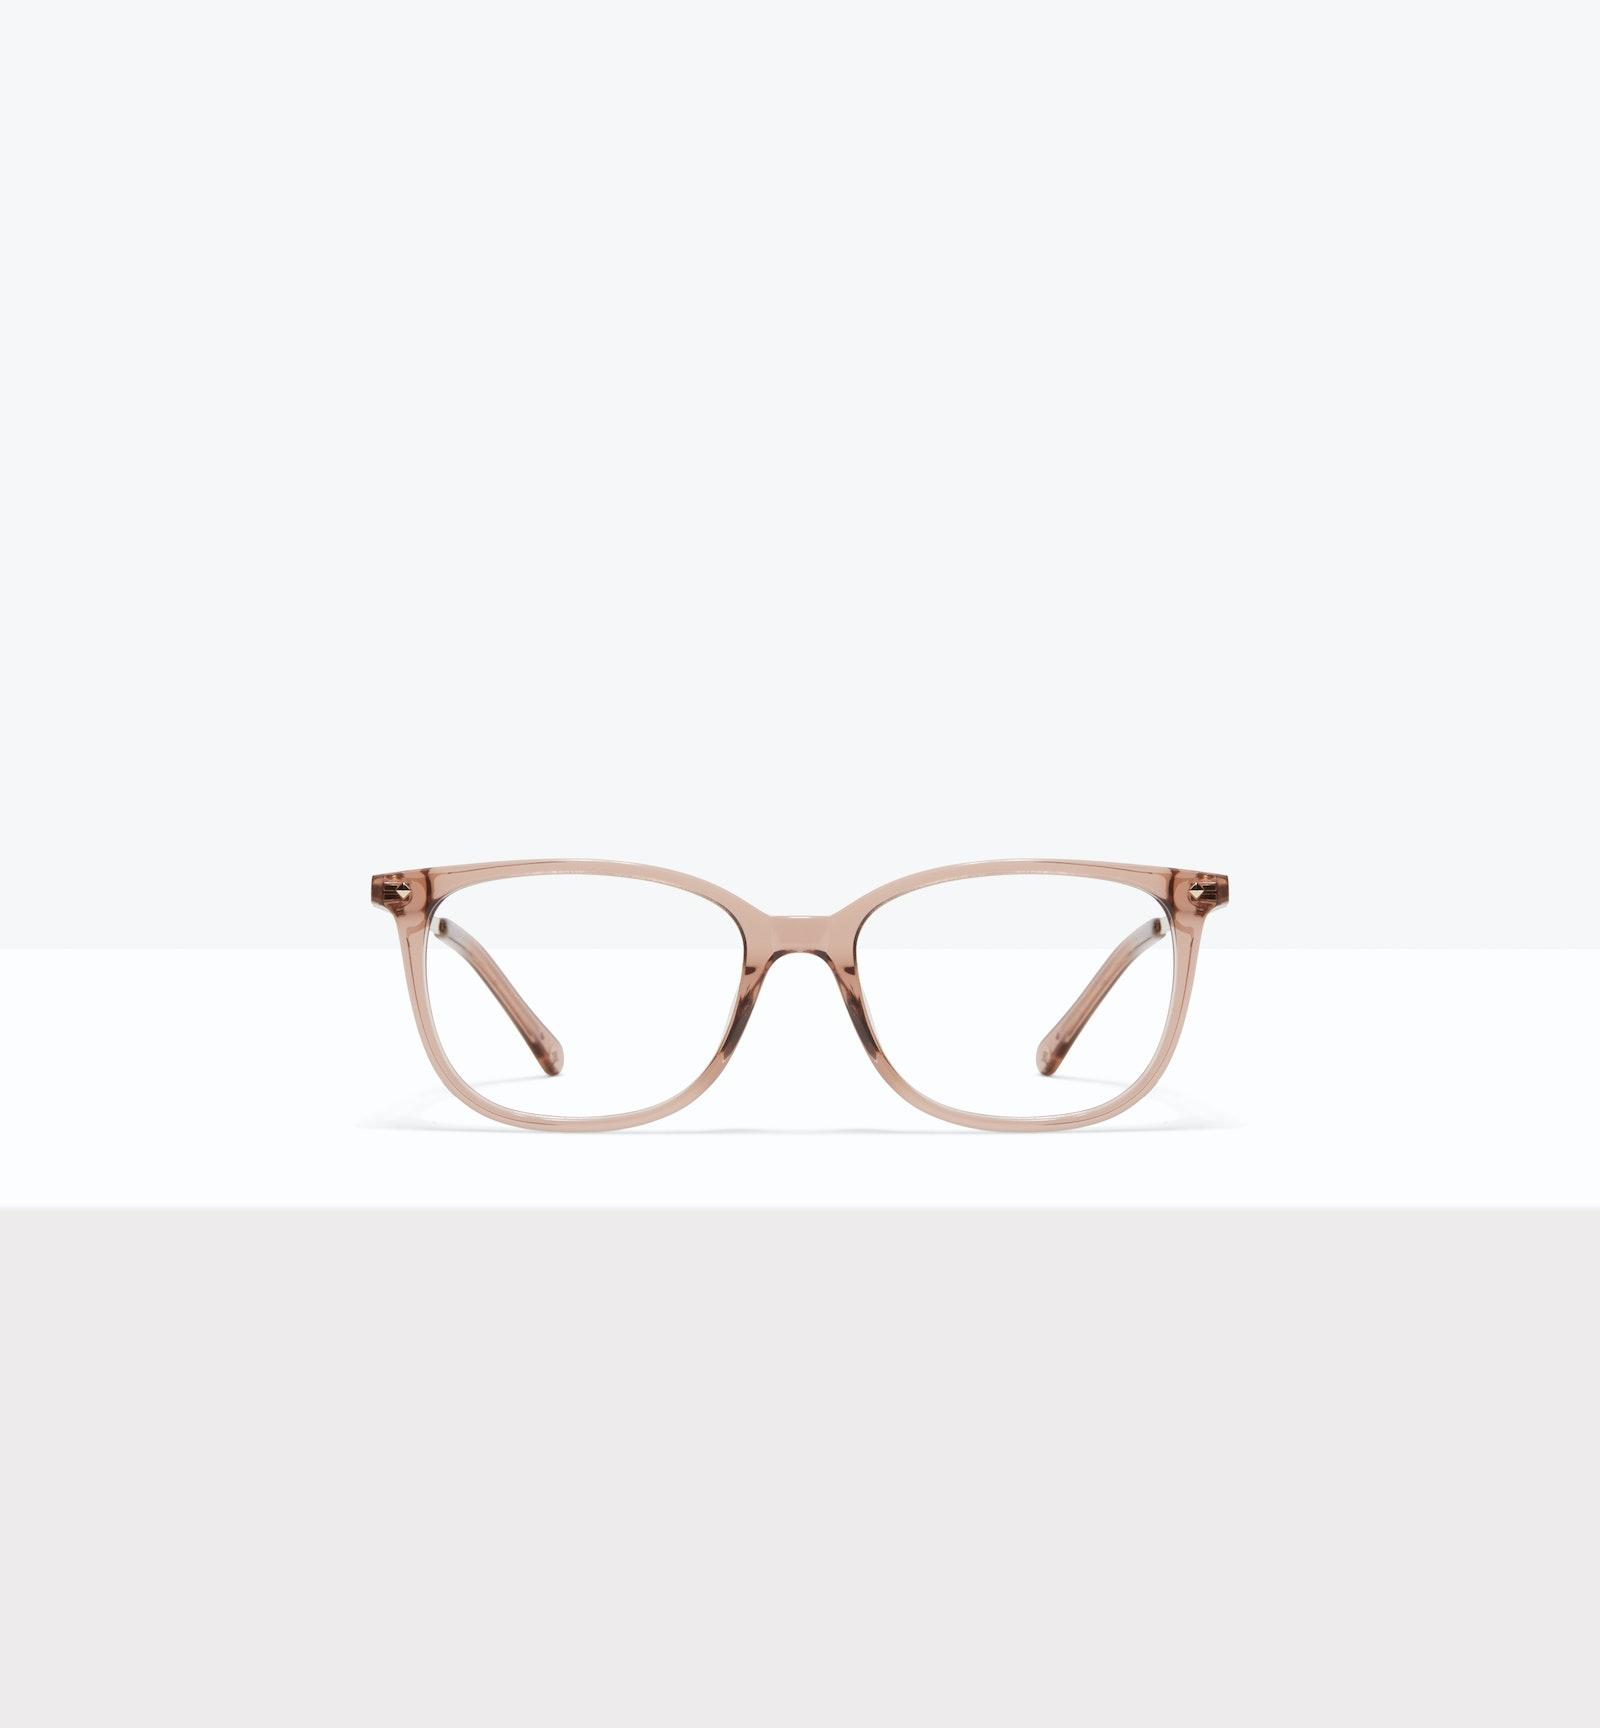 Affordable Fashion Glasses Rectangle Square Eyeglasses Women Refine S Rose